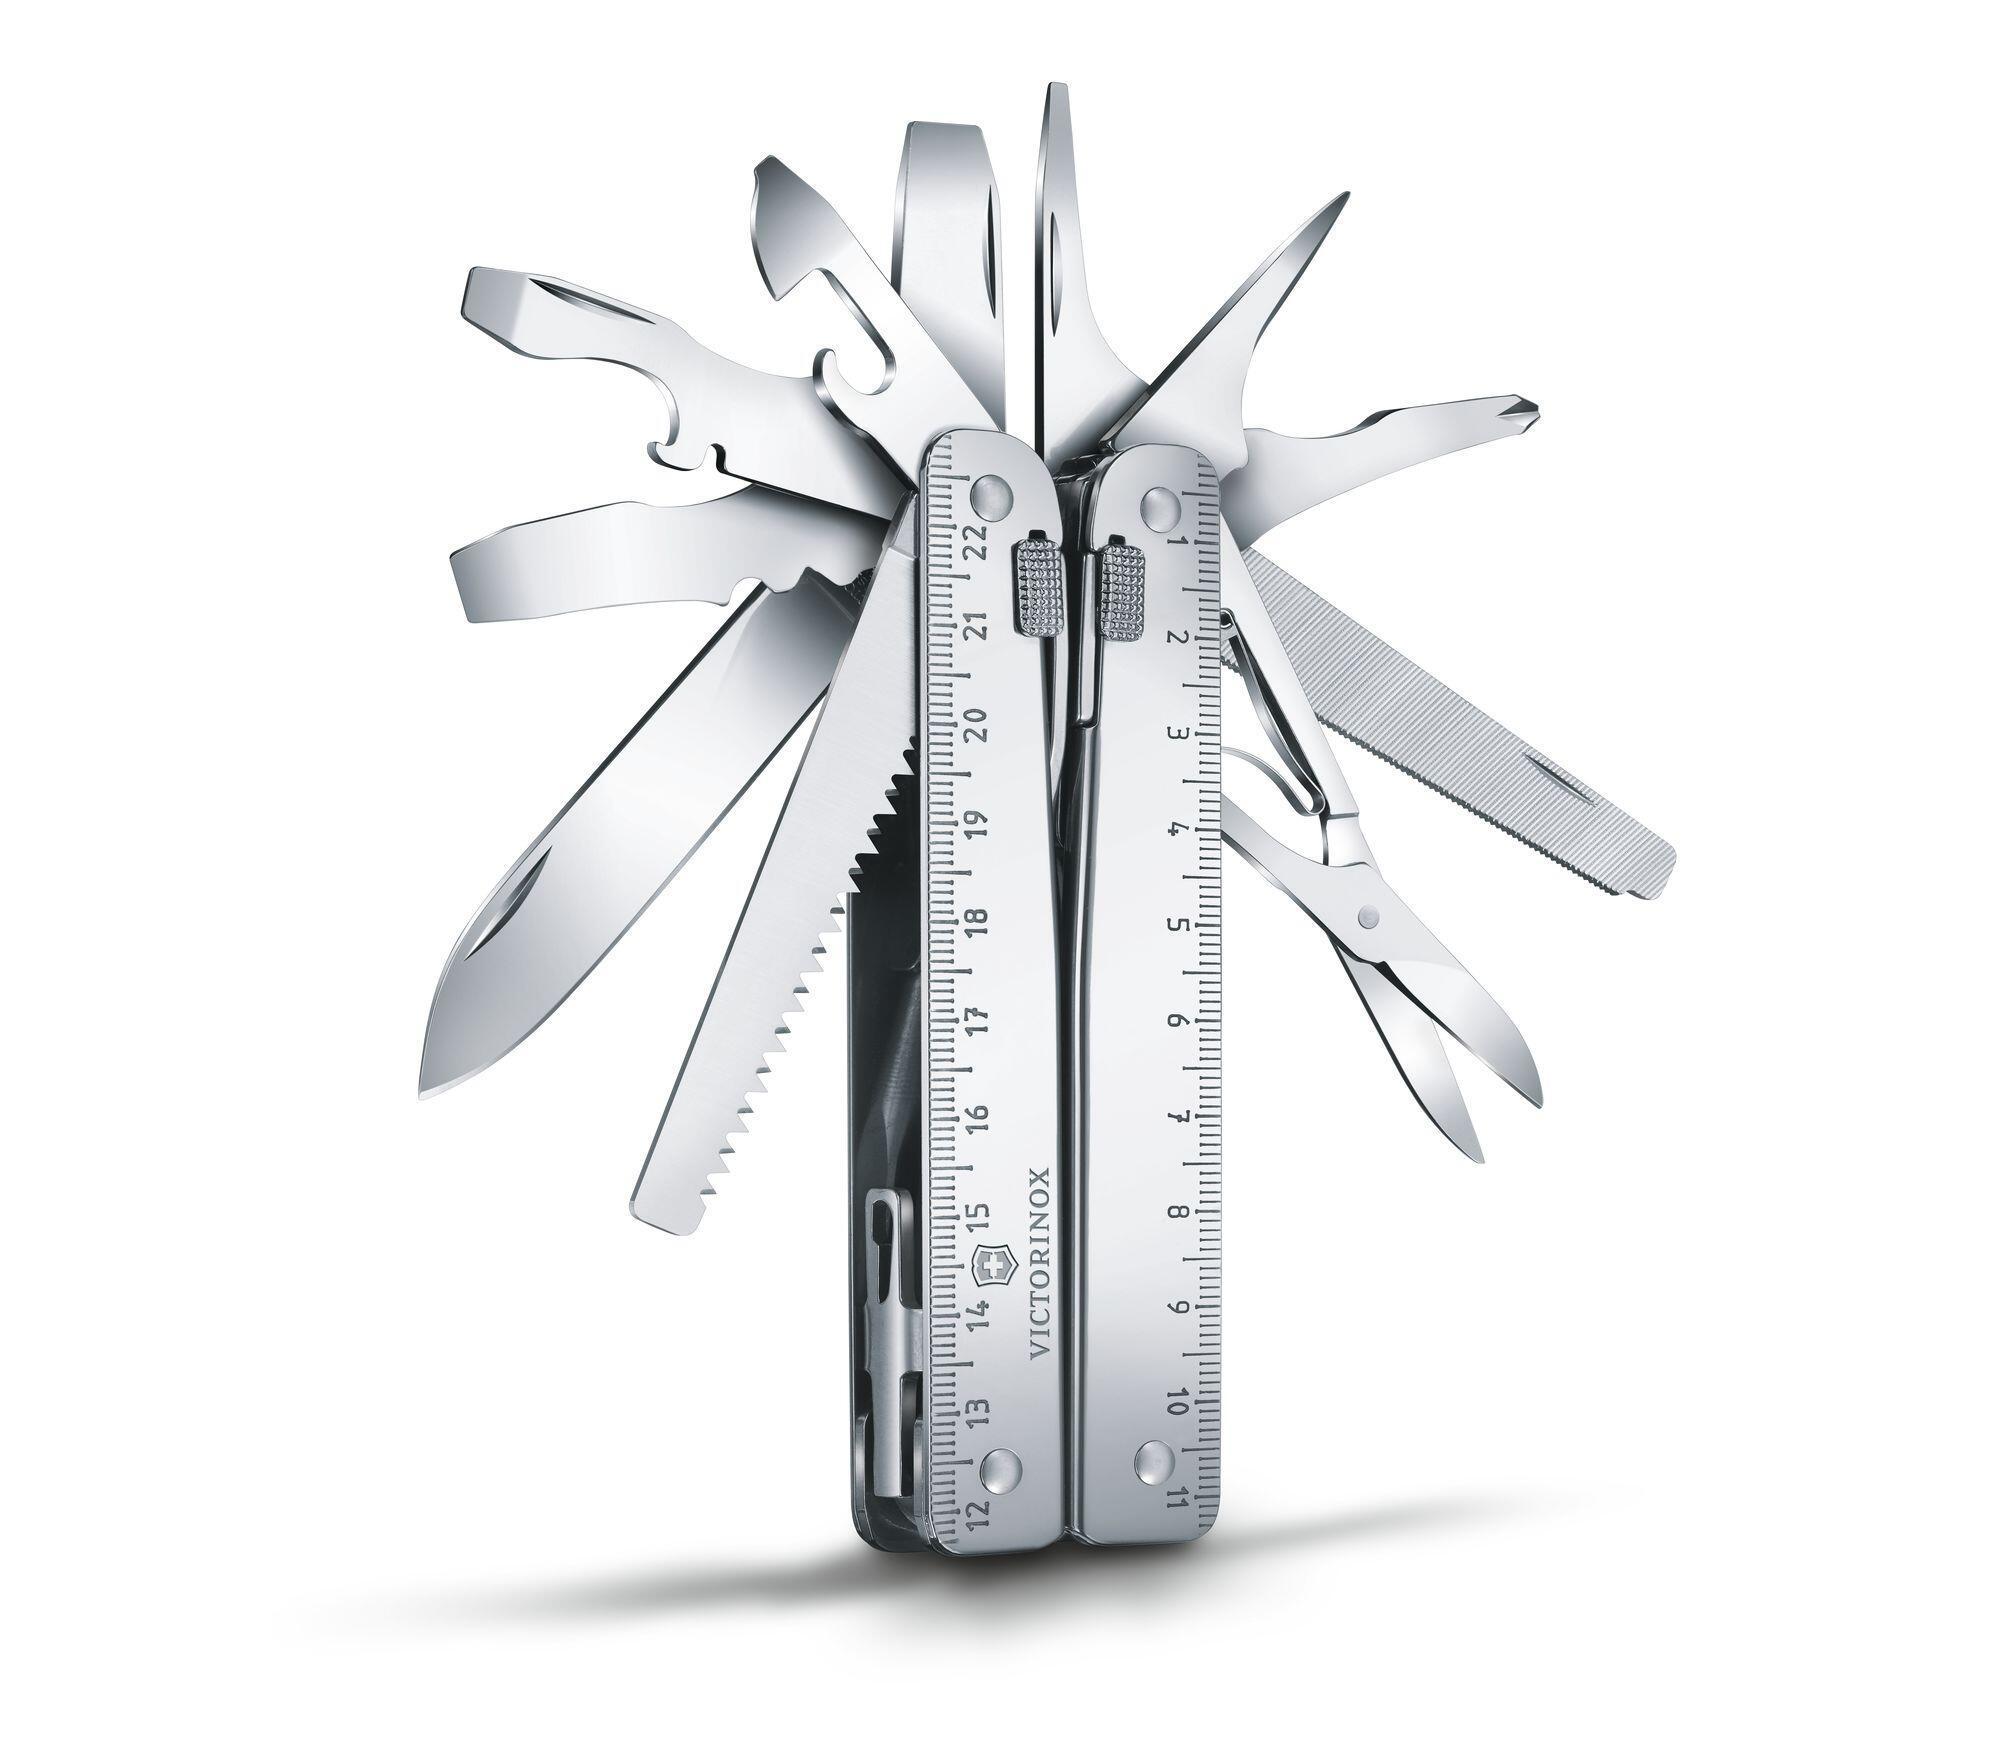 Мультитул Victorinox SwissTool X Plus Ratchet (3.0339.L) с набором бит, ключом-трещоткой, удлинителем и штопором | Wenger-Victorinox.Ru